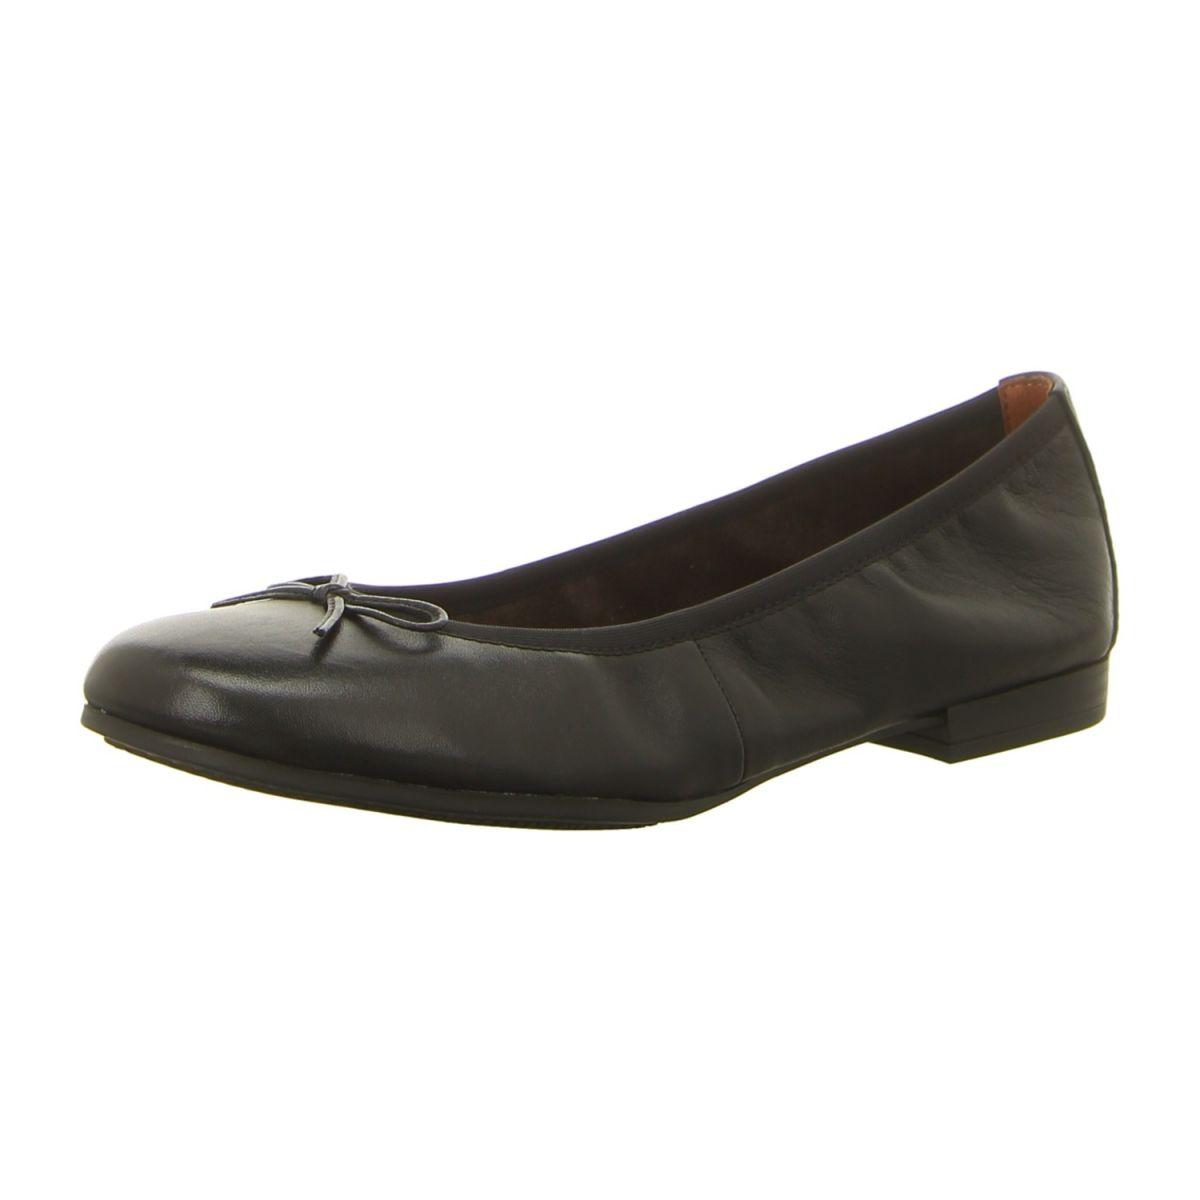 NEU: Tamaris Ballerinas 1 1 22116 20 003 black | Schuhe